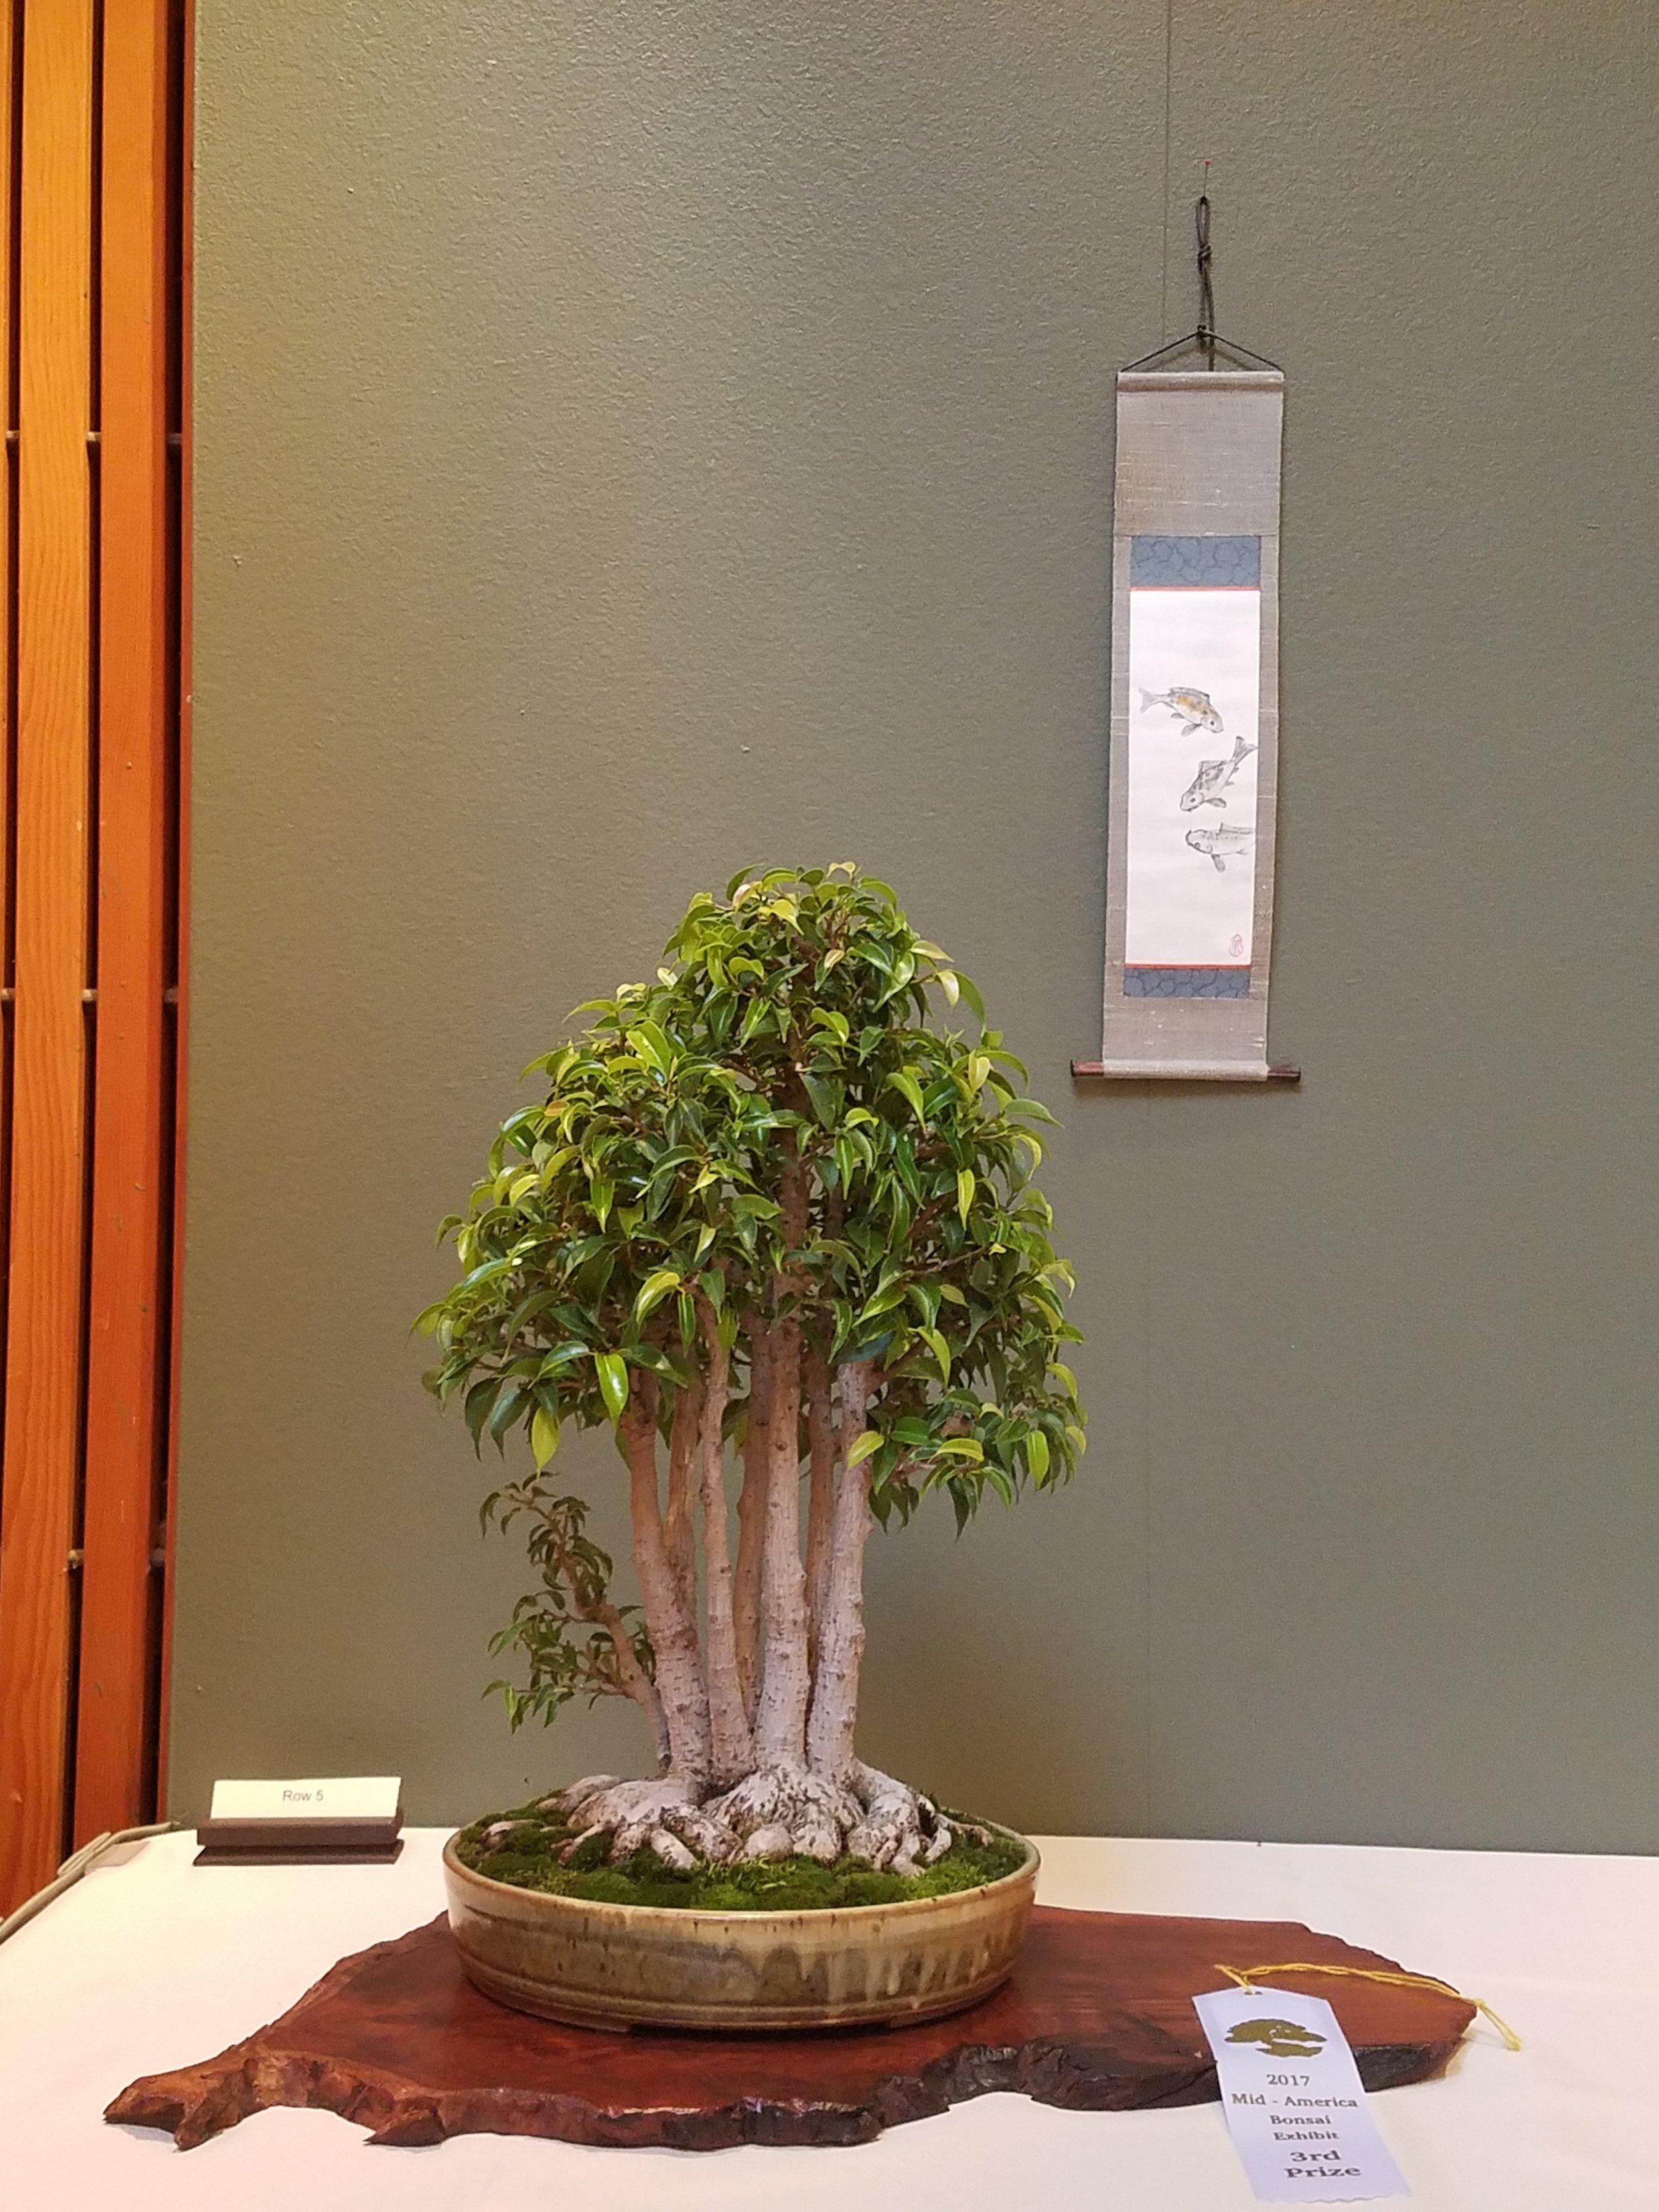 2017 Mid-America Bonsai Exhibition - Ficus - Clump